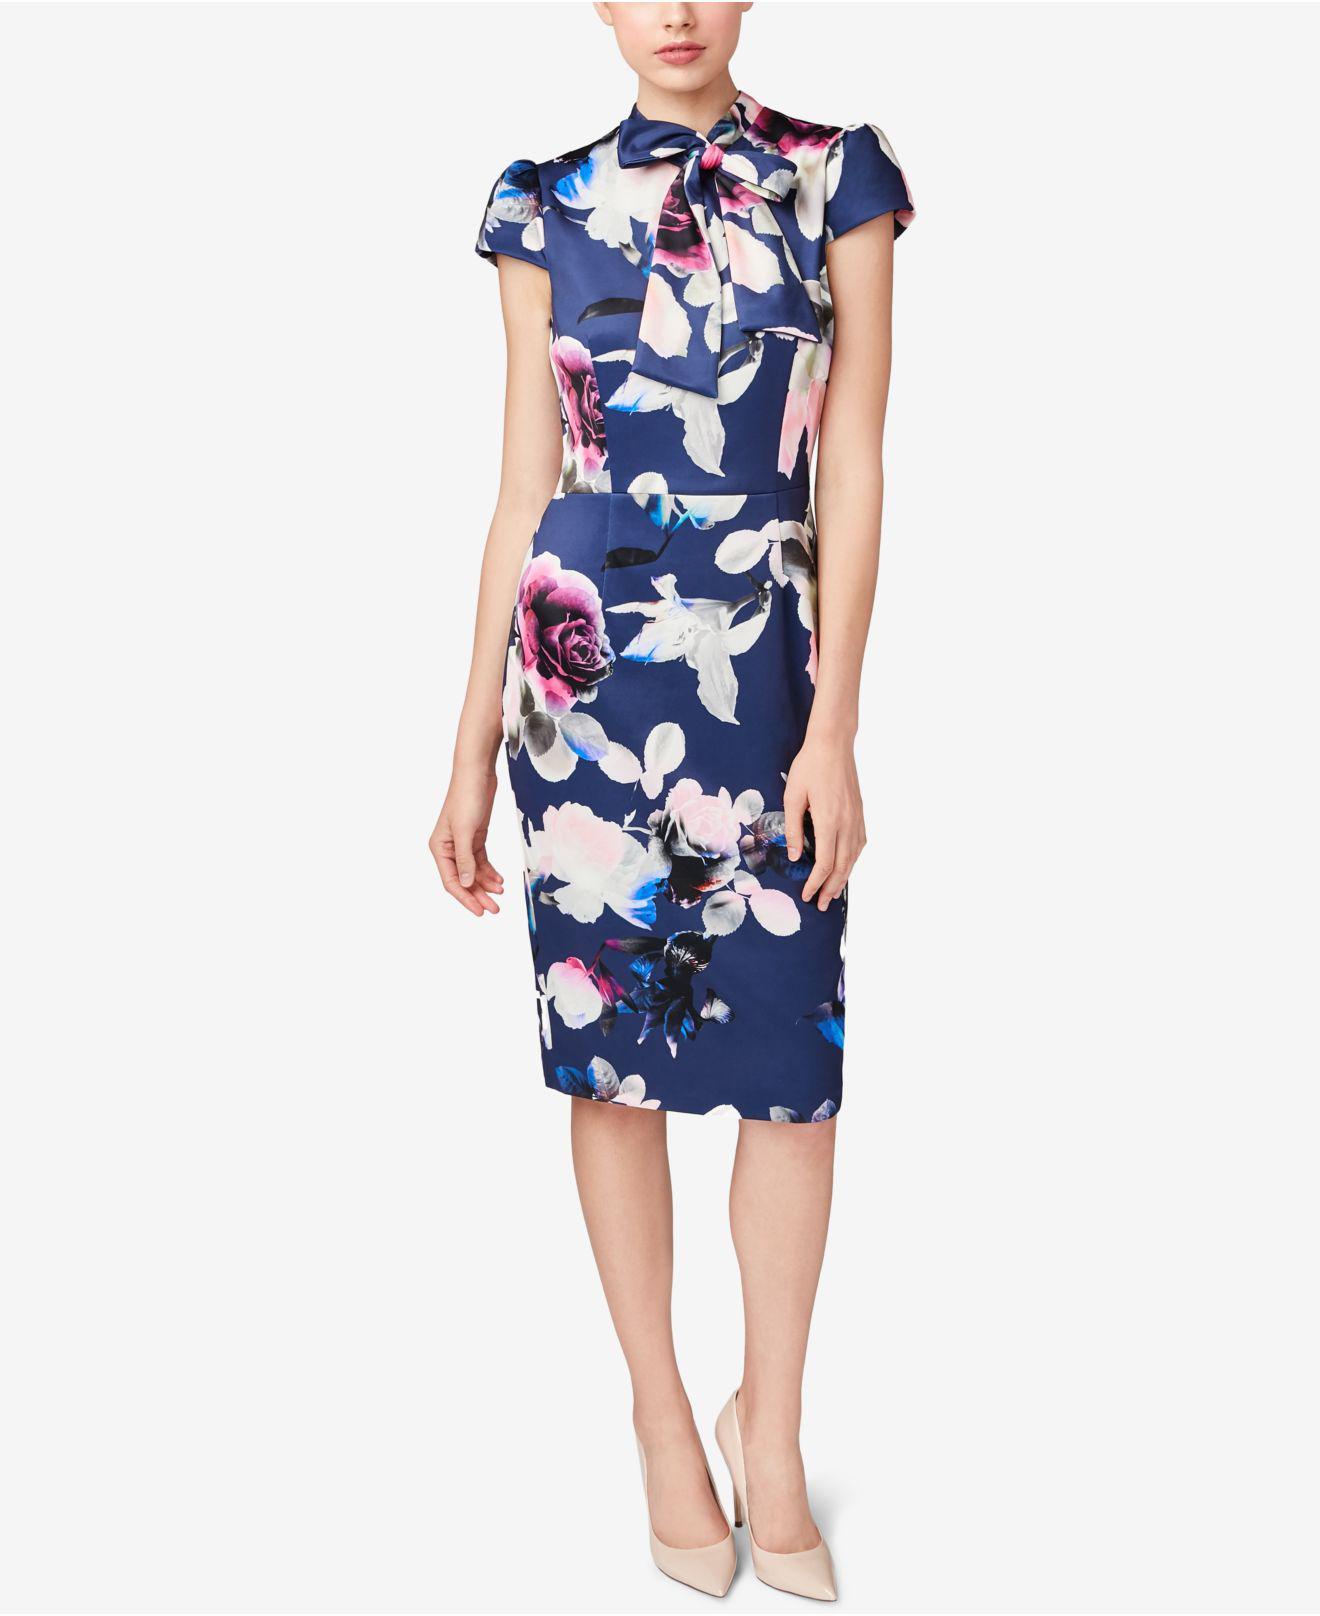 95732932b1dfb4 Betsey Johnson Tie-neck Sheath Dress in Blue - Lyst